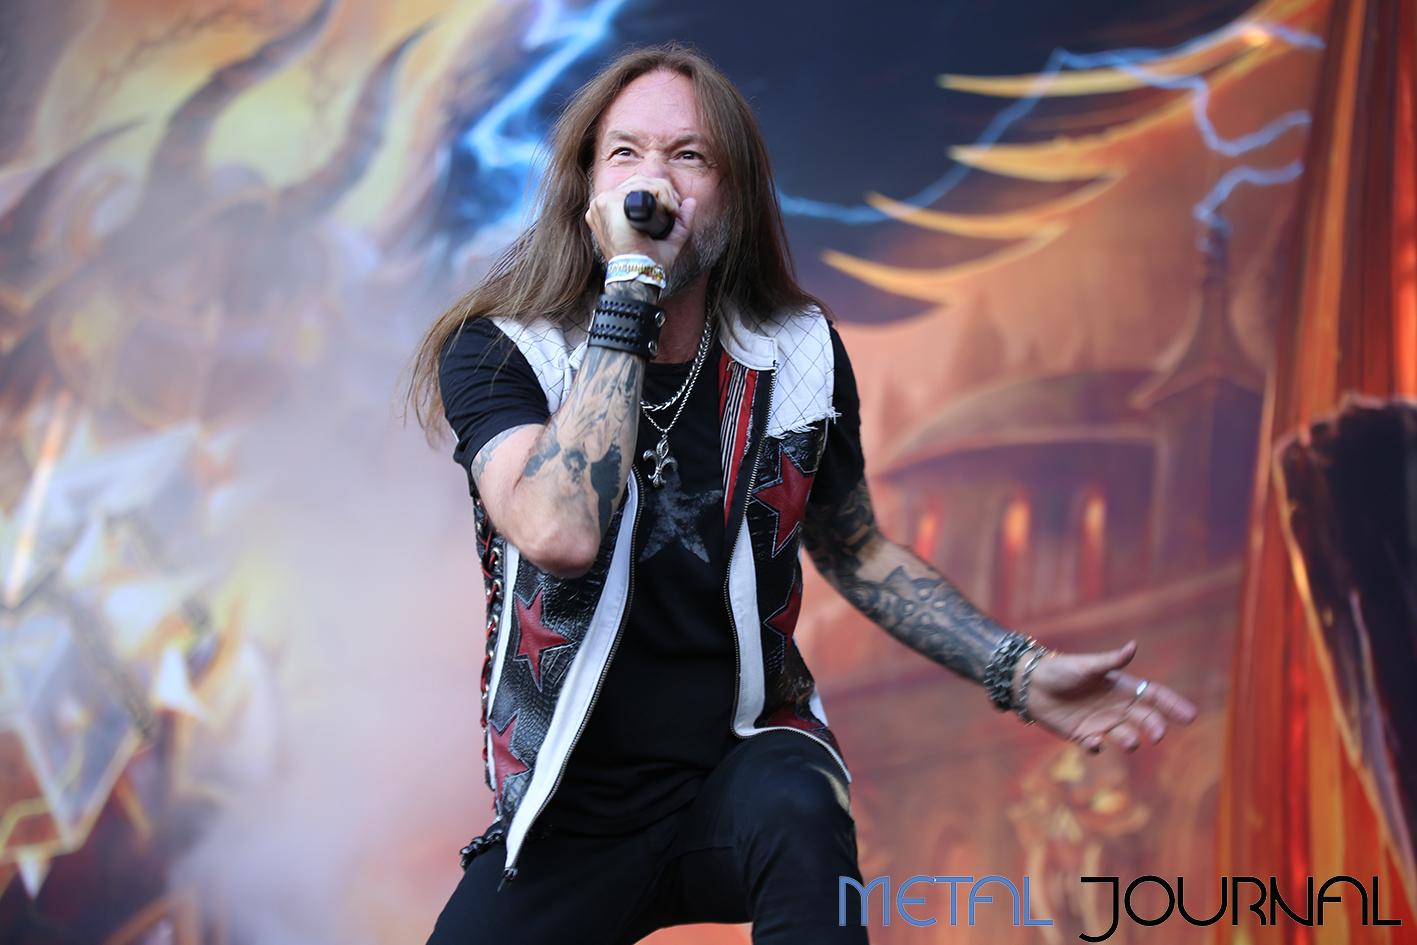 hammerfall - leyendas del rock 2019 metal journal pic 1